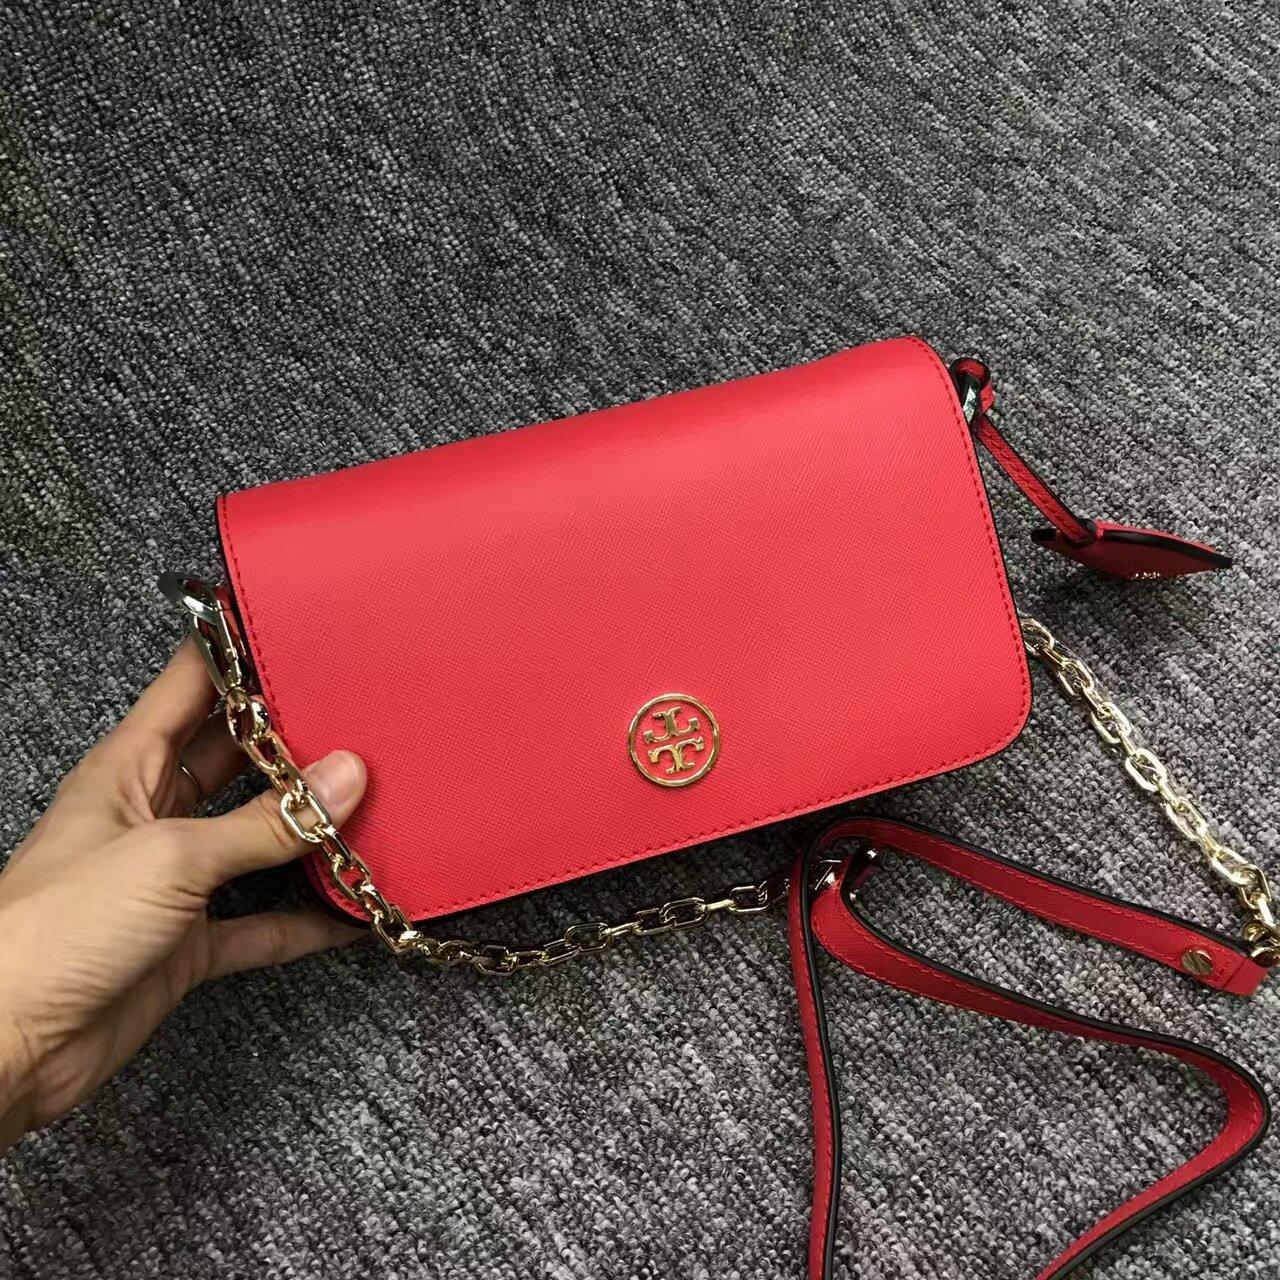 6d51beab88aa Tory Burch Robinson Chain Mini Bag and 50 similar items.  Mmexport1488437405255. Mmexport1488437405255